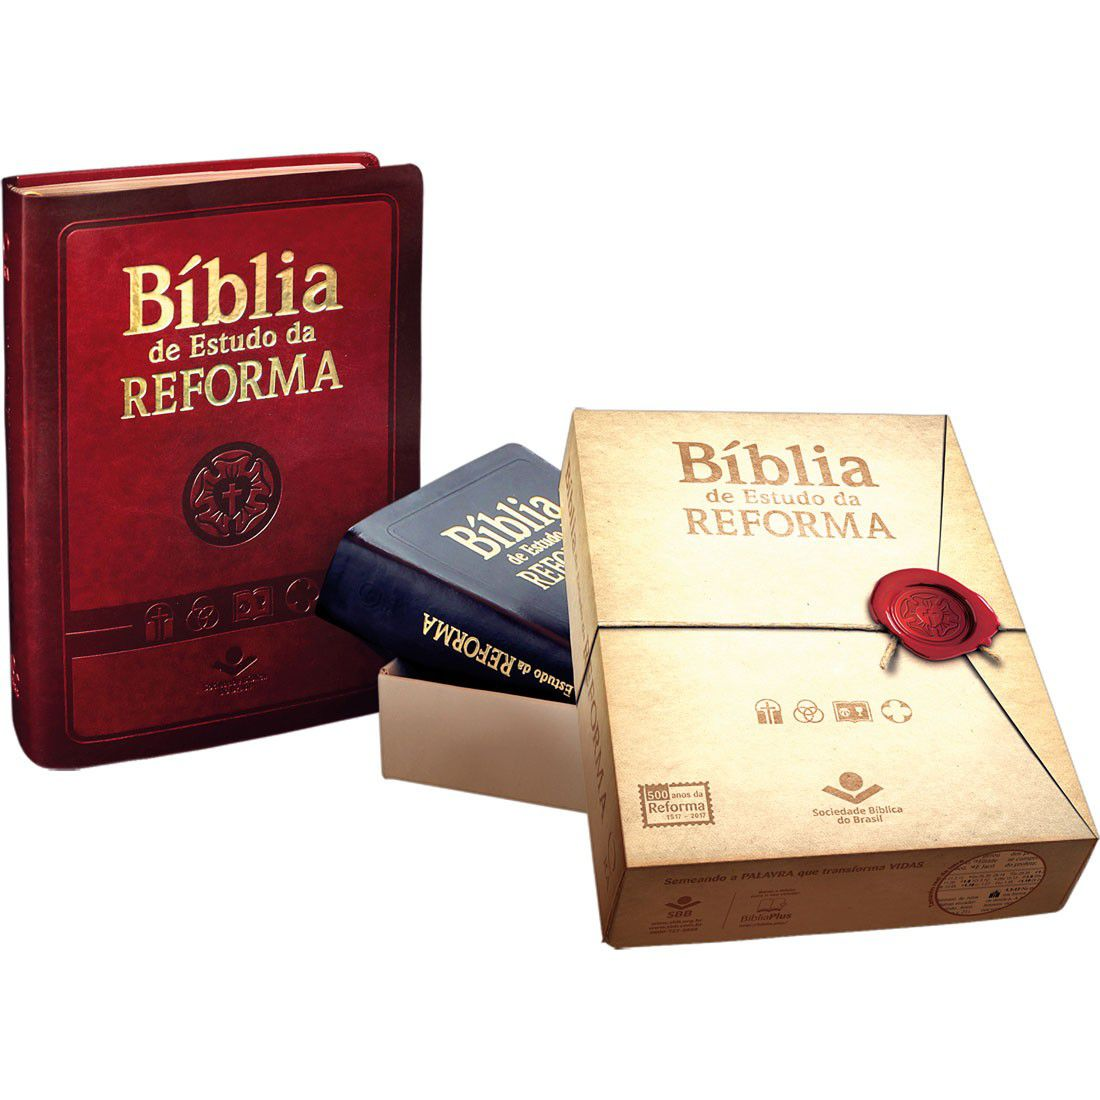 Bíblia de Estudo da Reforma - Luxo - Cor Preta